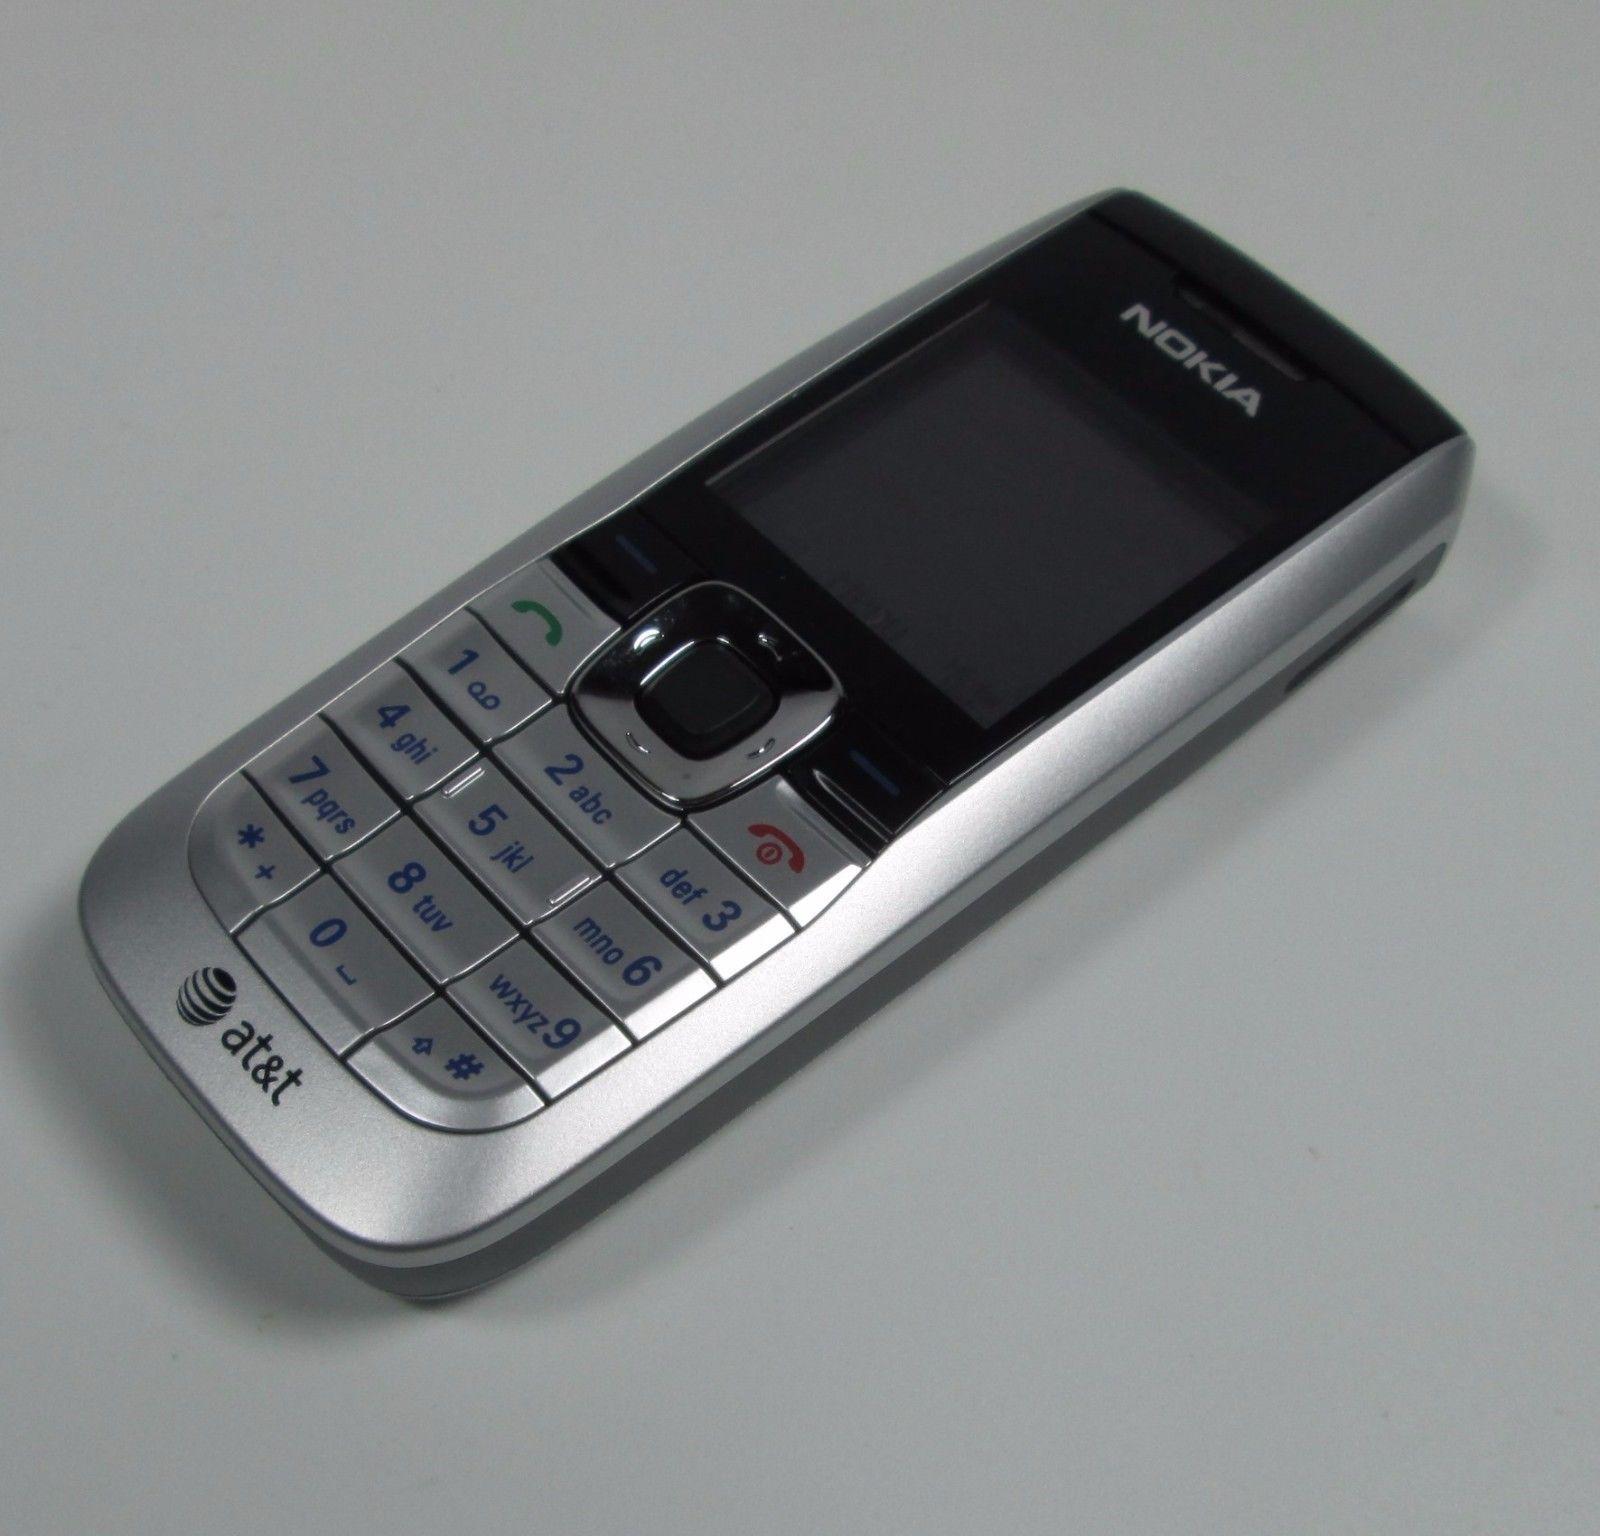 Camolinz Nokia 2610 White Camolinz Nokia 2610 White